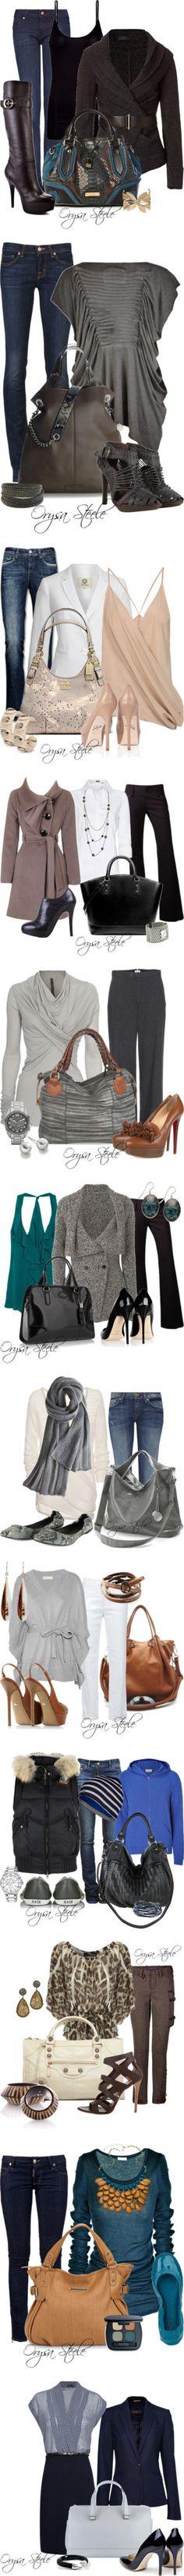 lots of fall fashion ideas!